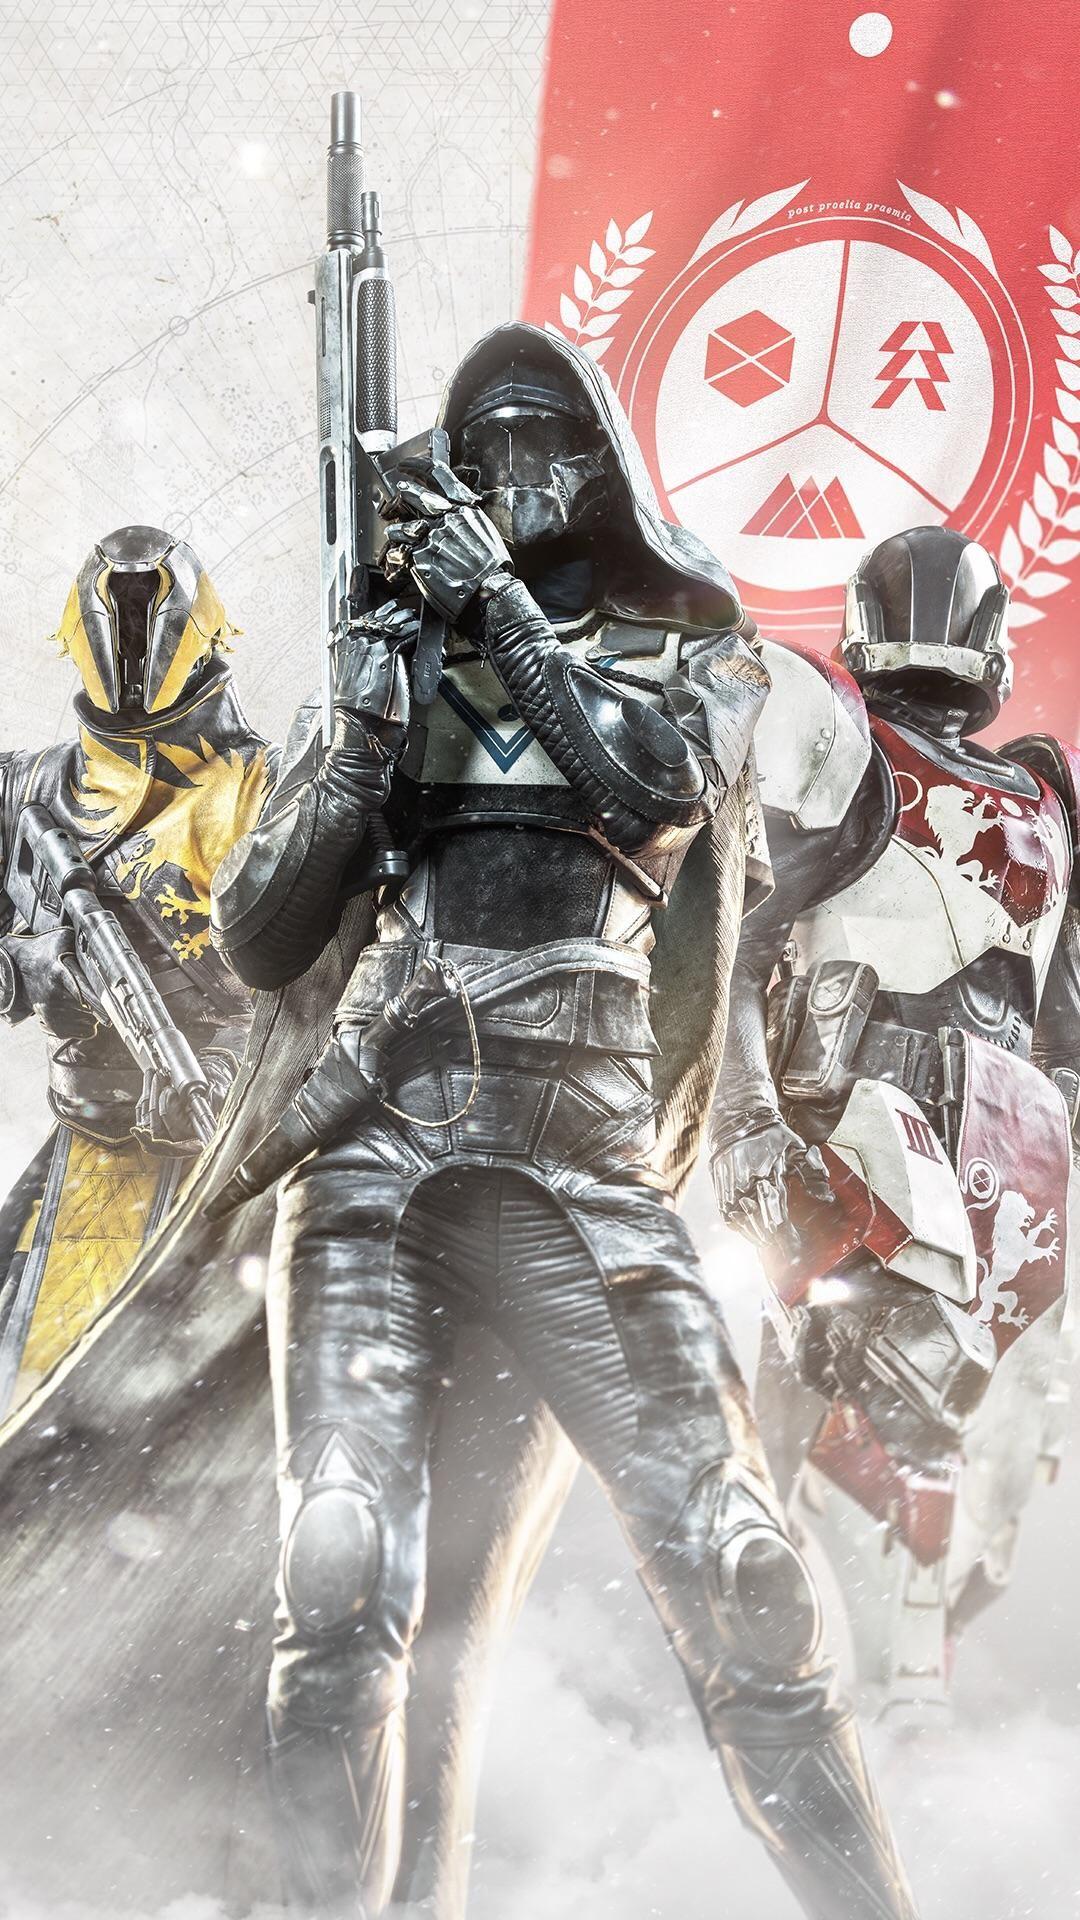 Destiny 2 Guardians Smartphone Wallpaper Gaming Pinterest